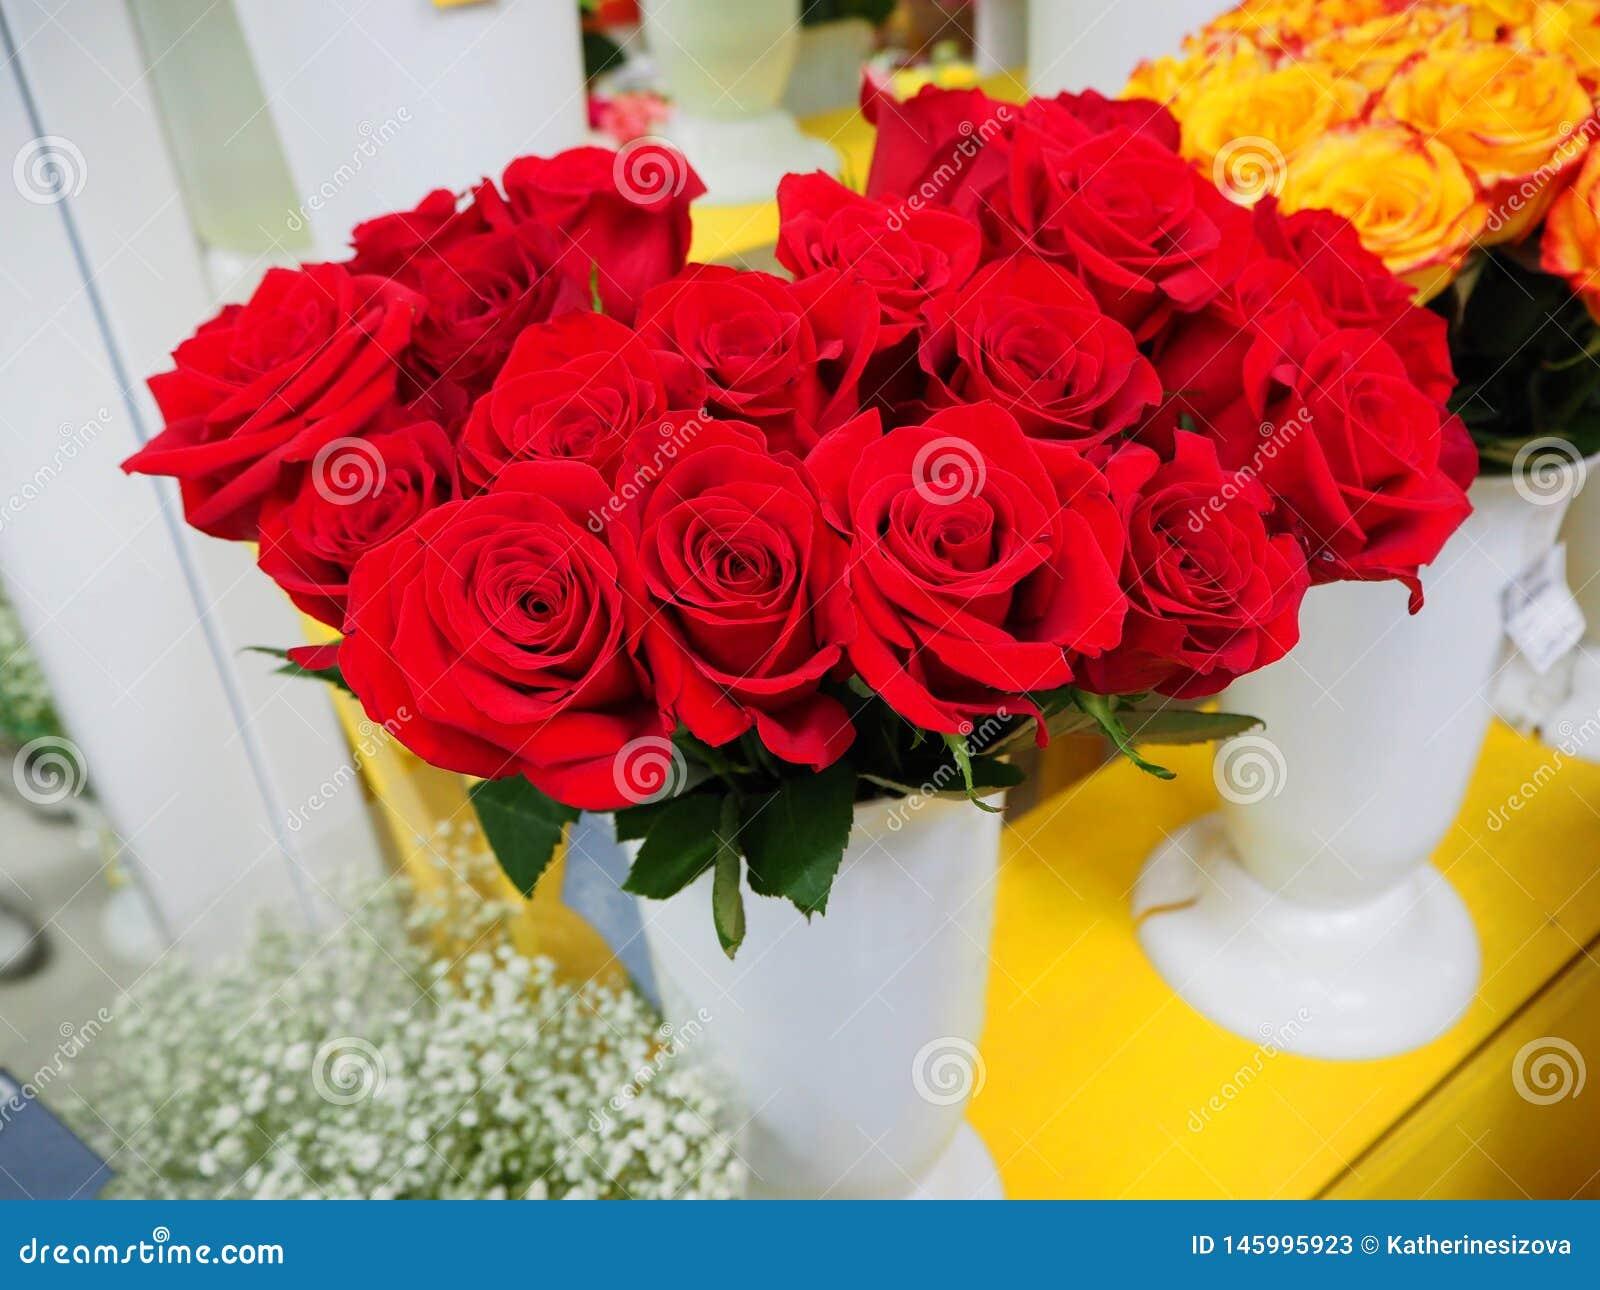 Un ramo de rosas rojas en un florero